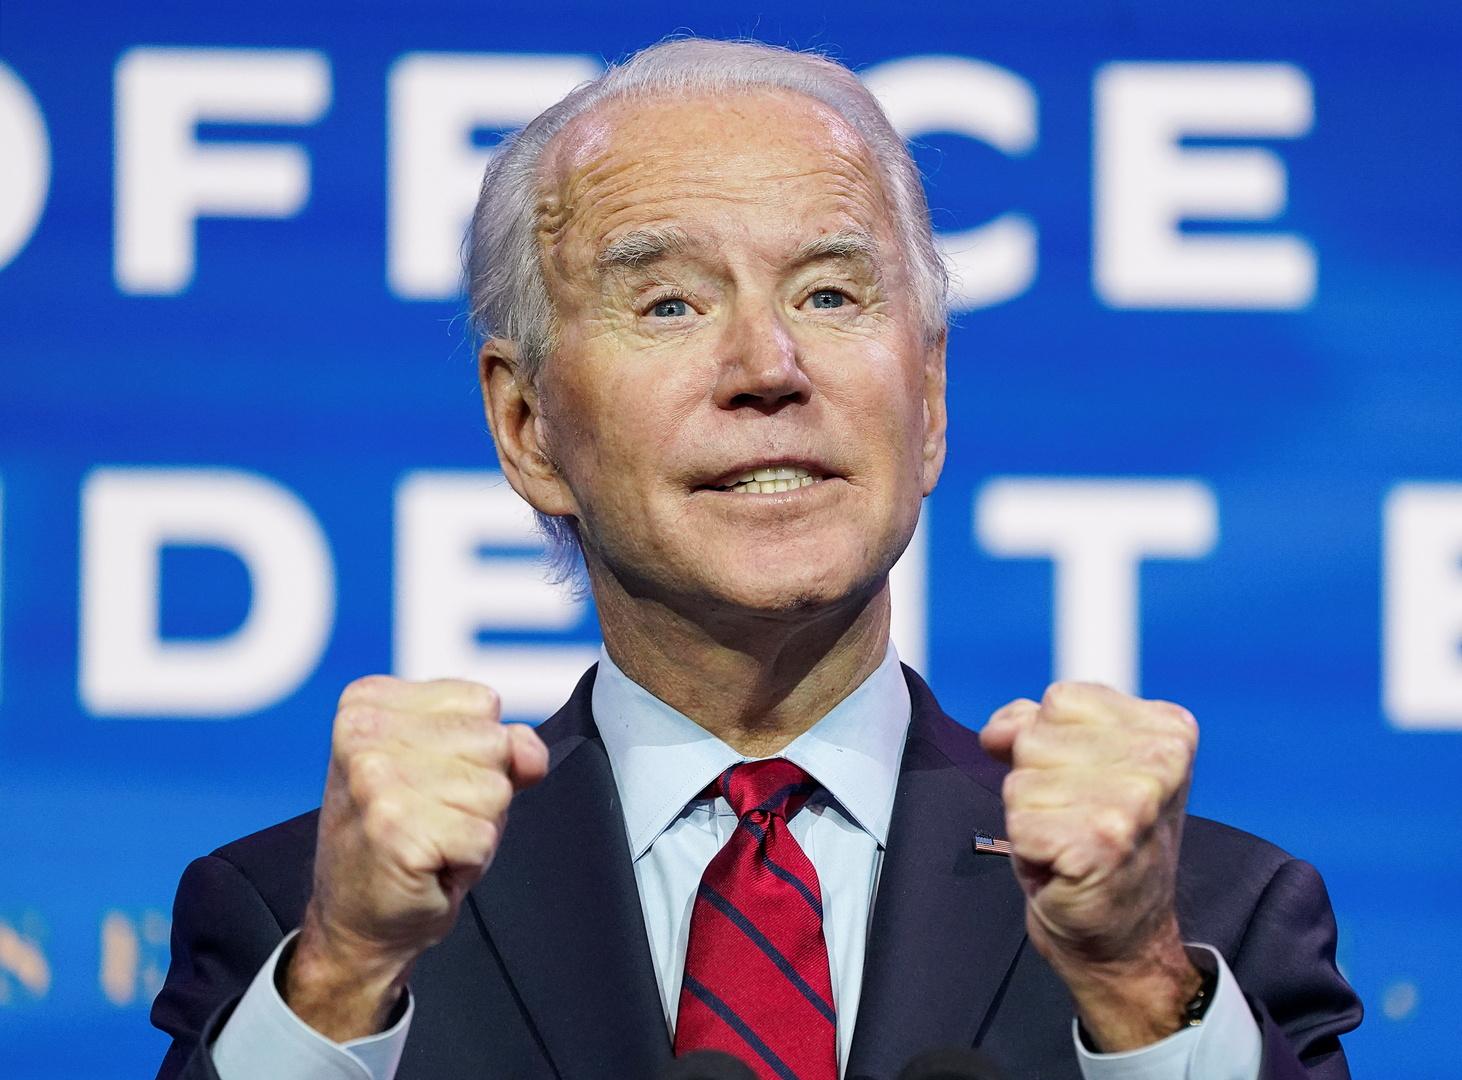 Biden's unusual flight to Washington before his inauguration